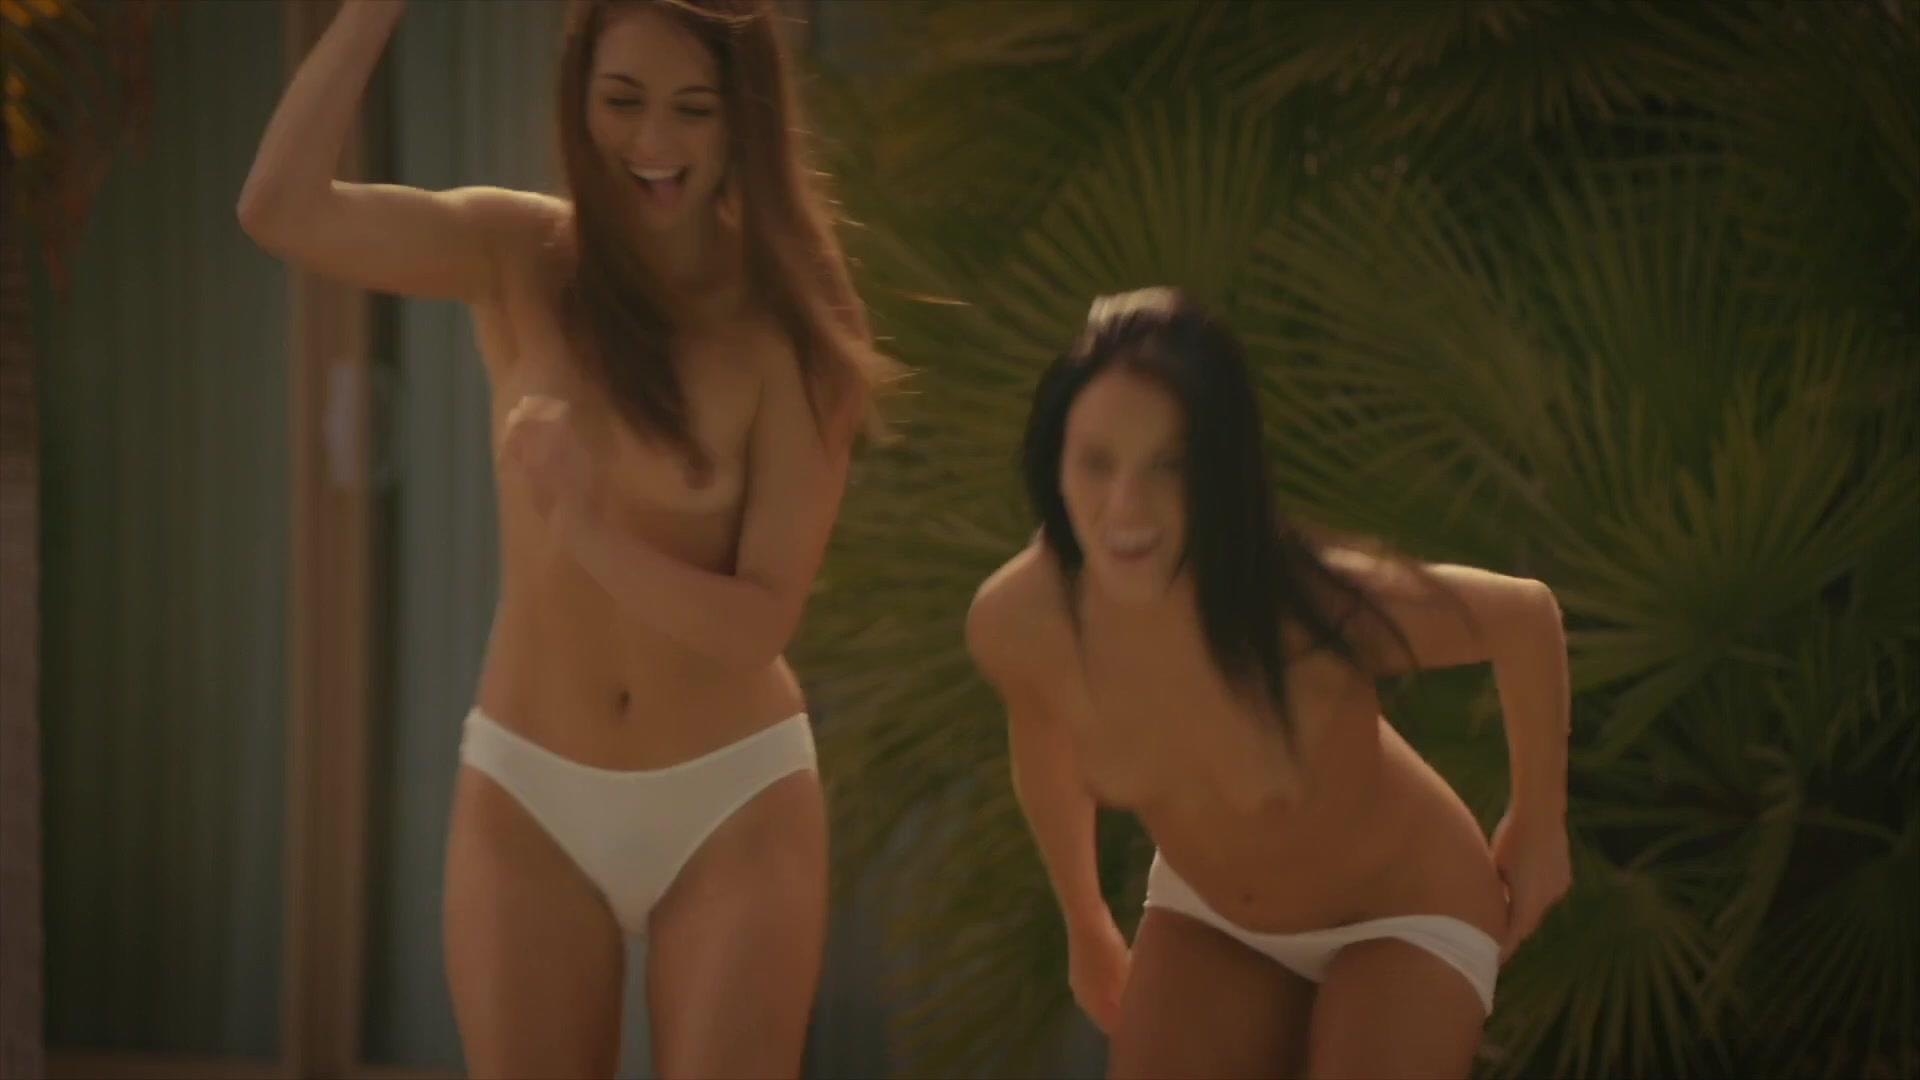 free mature women nude pix Quality porn